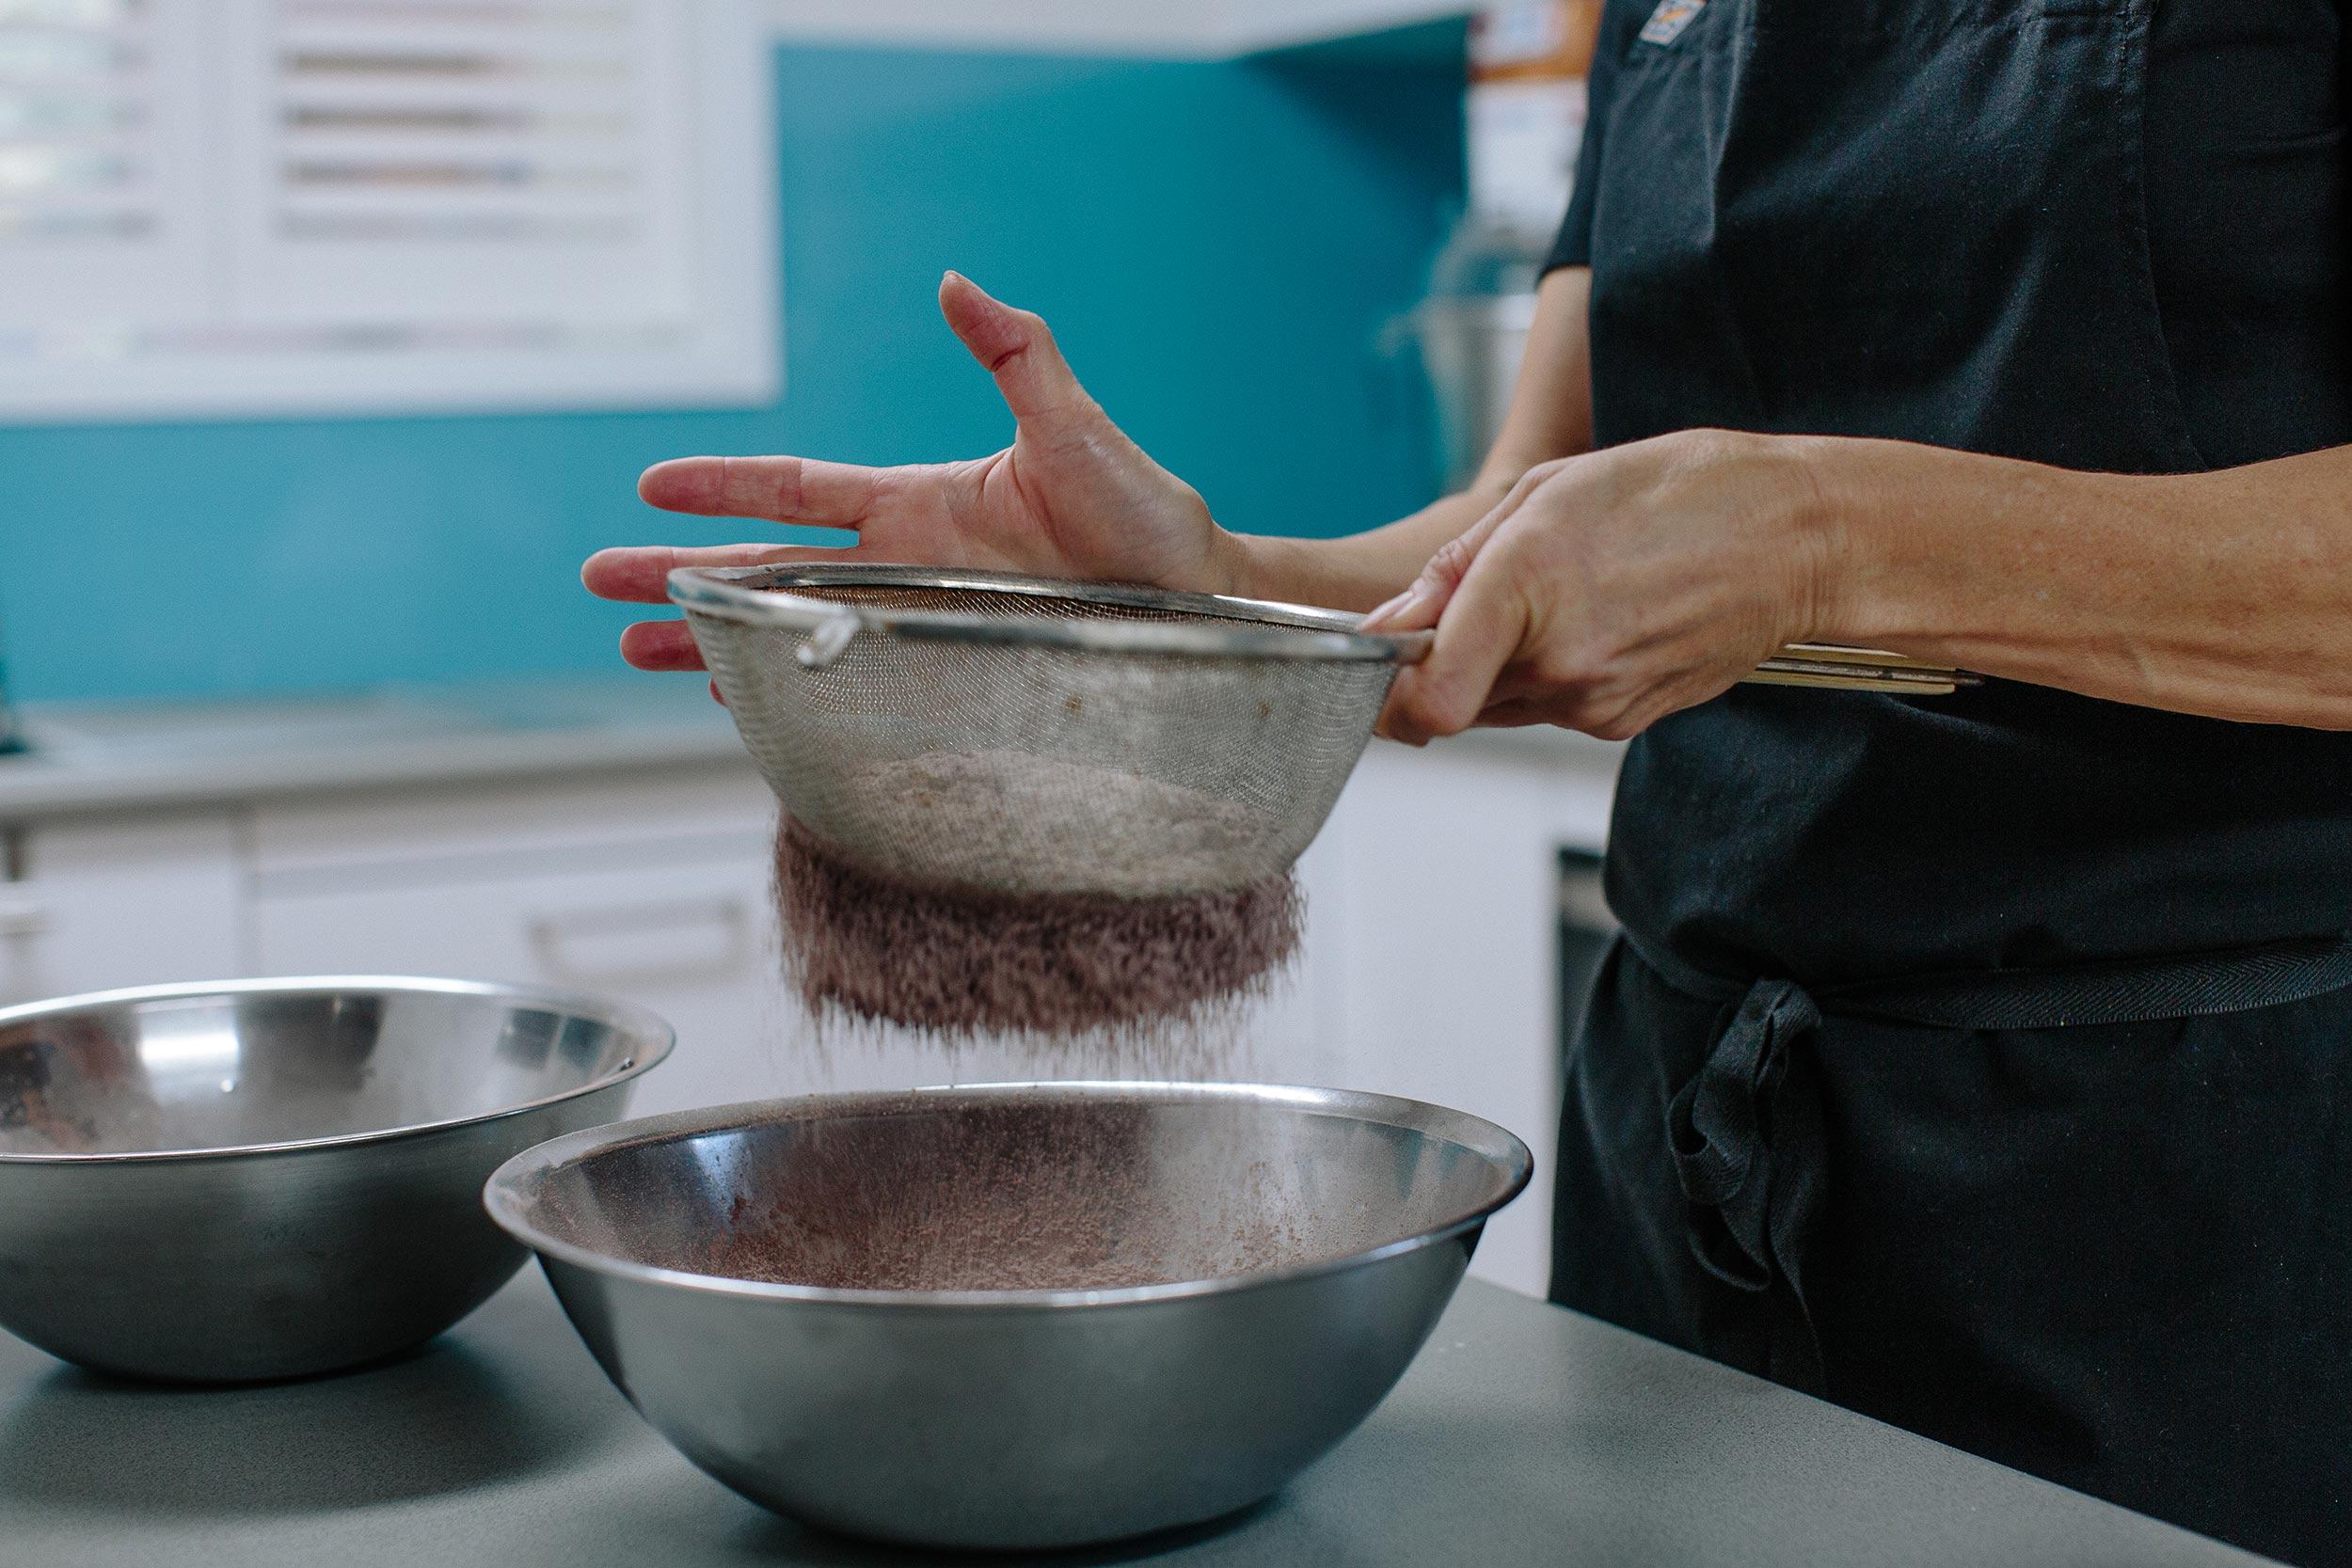 glft-nadine-cake-queen-local-cake-creation.jpg